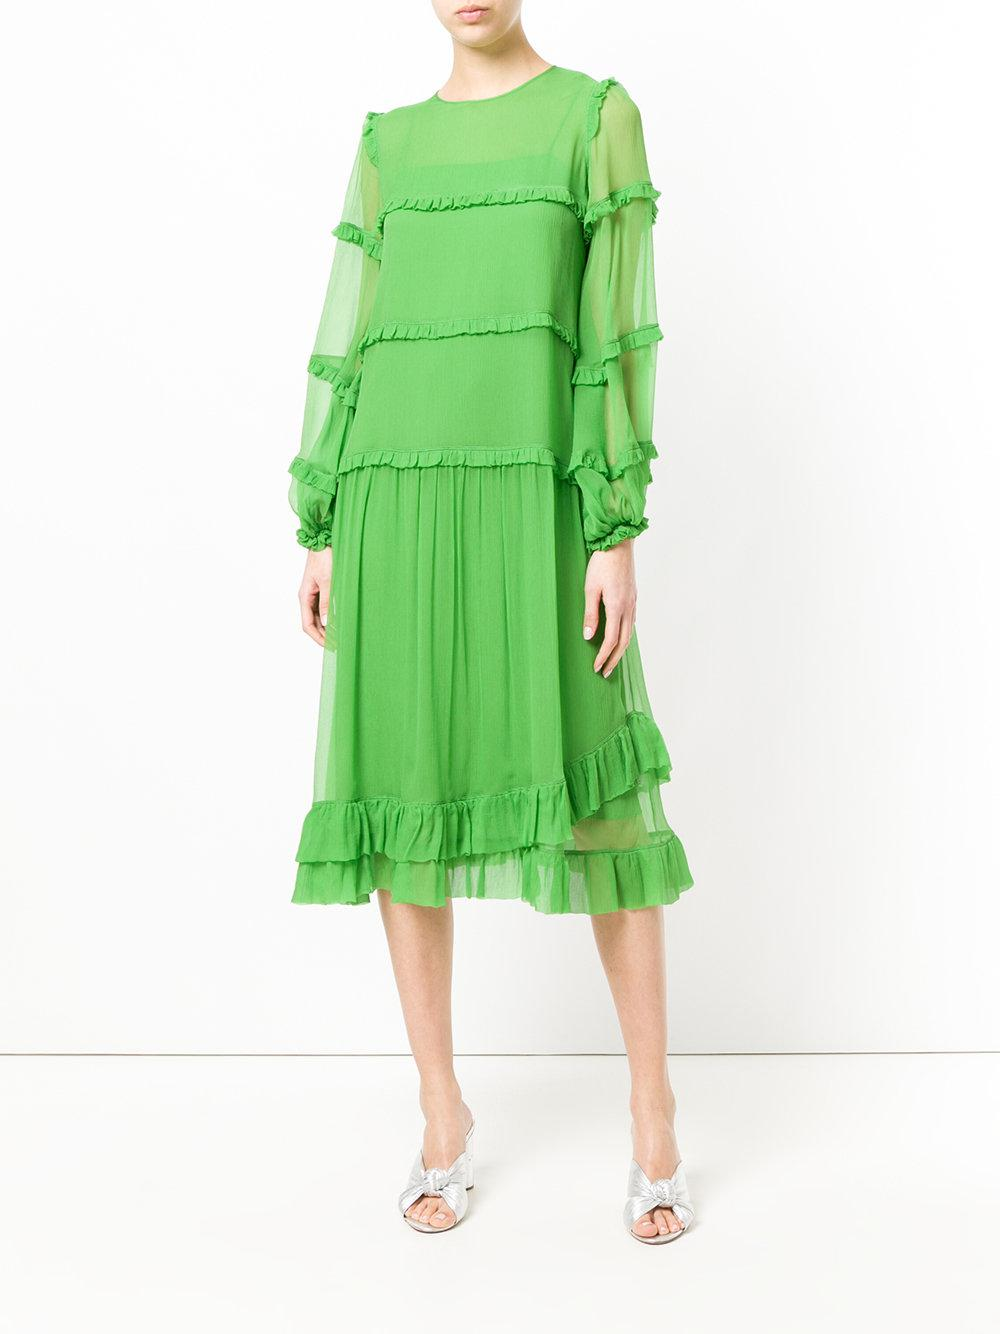 For Cheap Cheap Online longsleeved ruffle dress - Green N°21 Real 9oupDVp3g